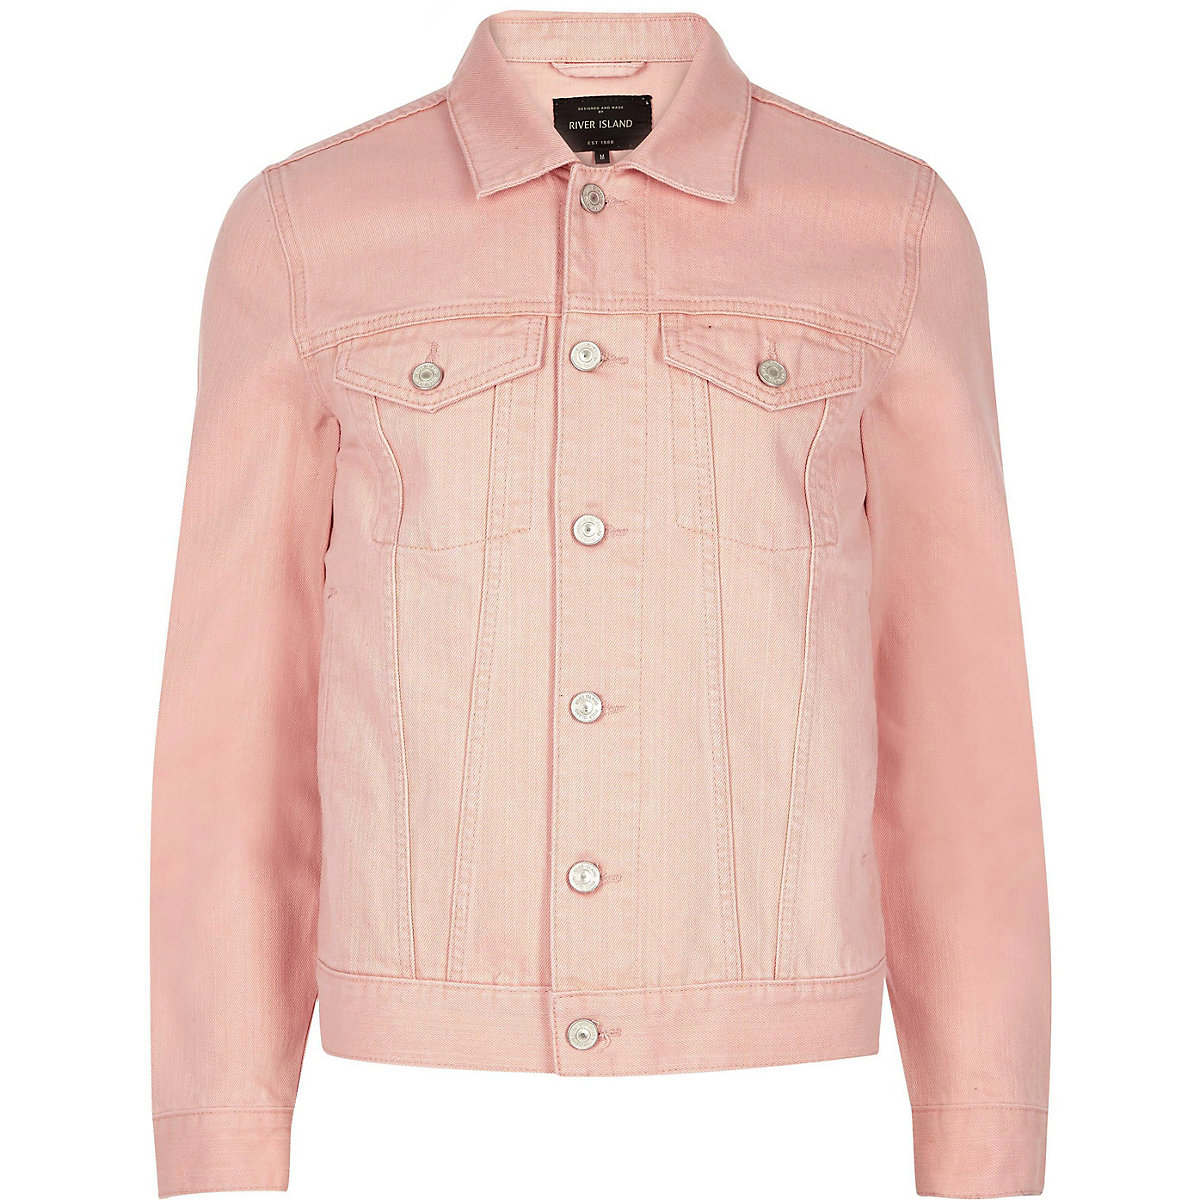 Big and Tall pink denim jacket